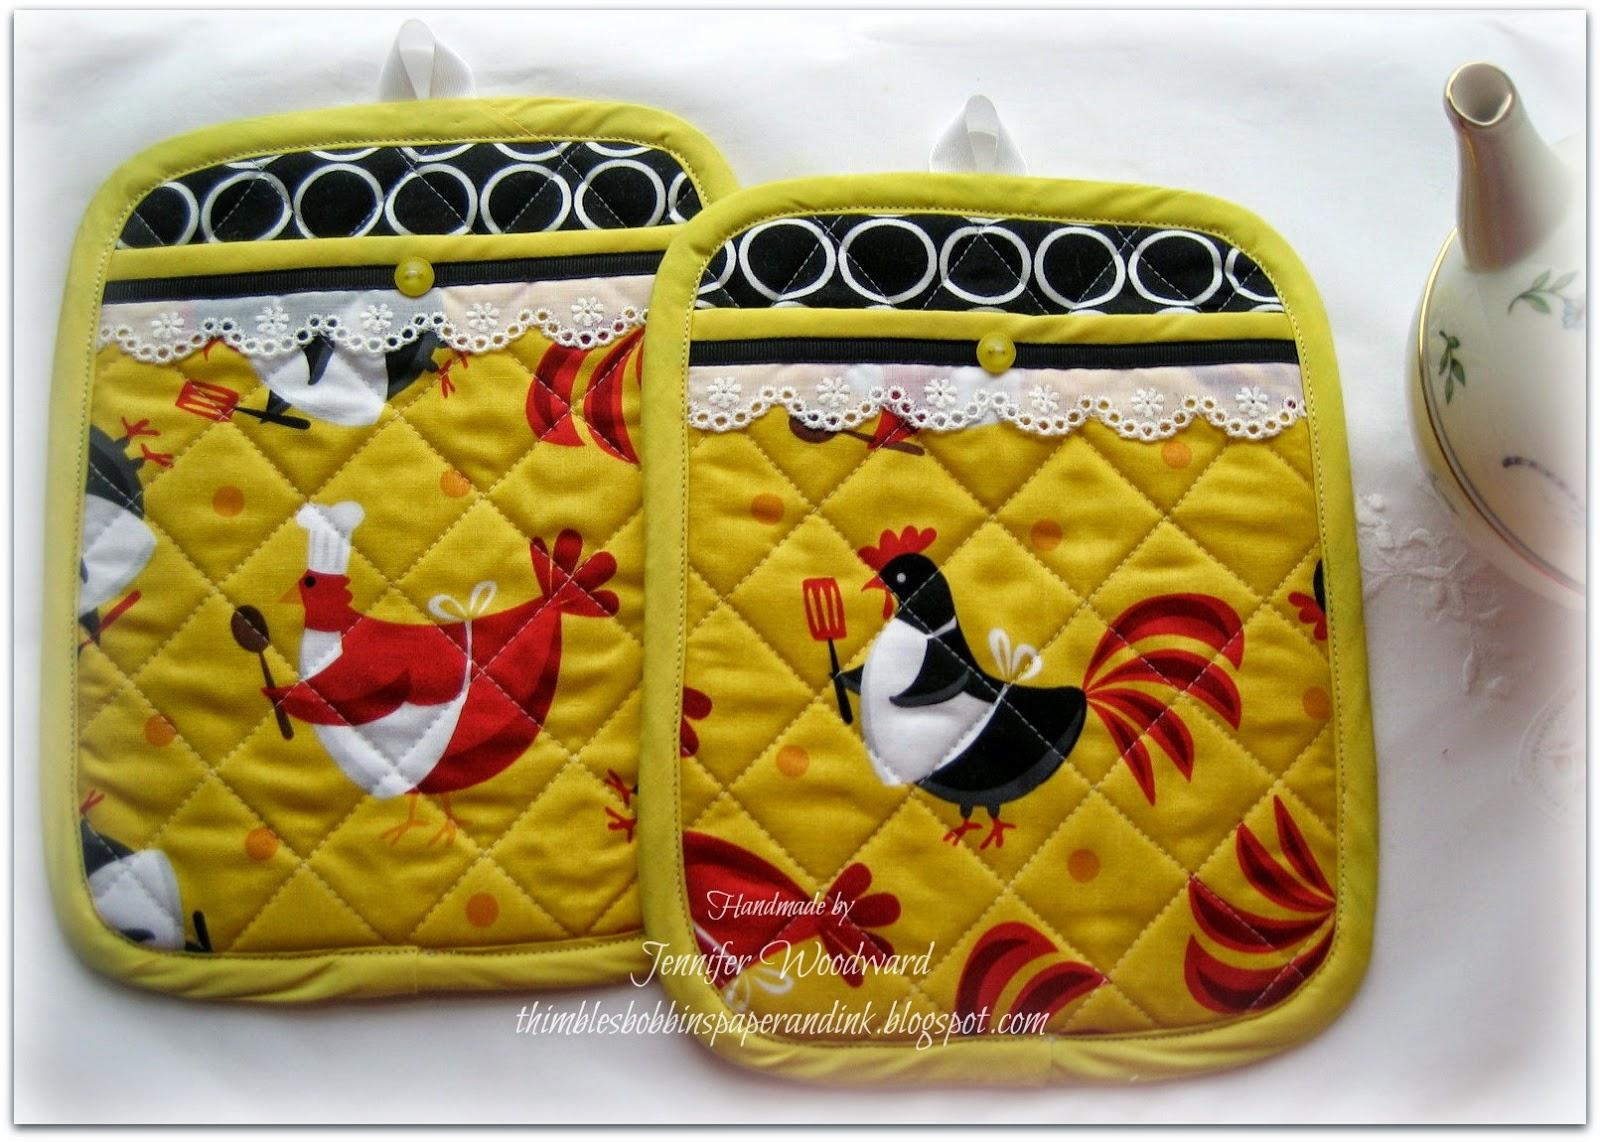 Chicken Themed Kitchen thimbles, bobbins, paper and ink: chicken themed kitchen linens